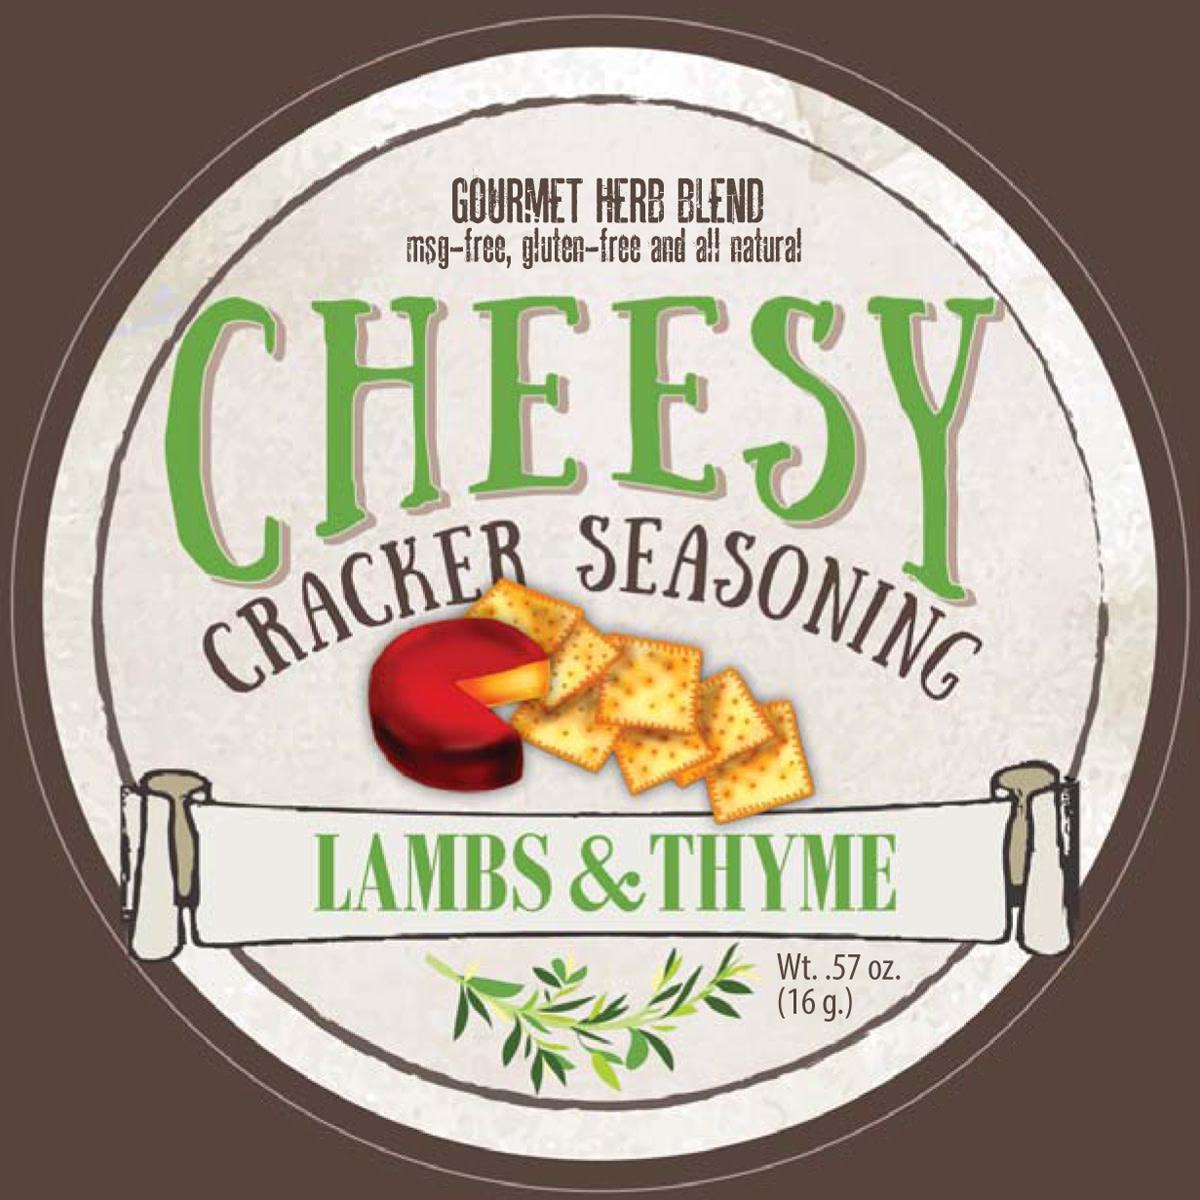 Lambs & Thyme Cheesy Cracker Seasoning